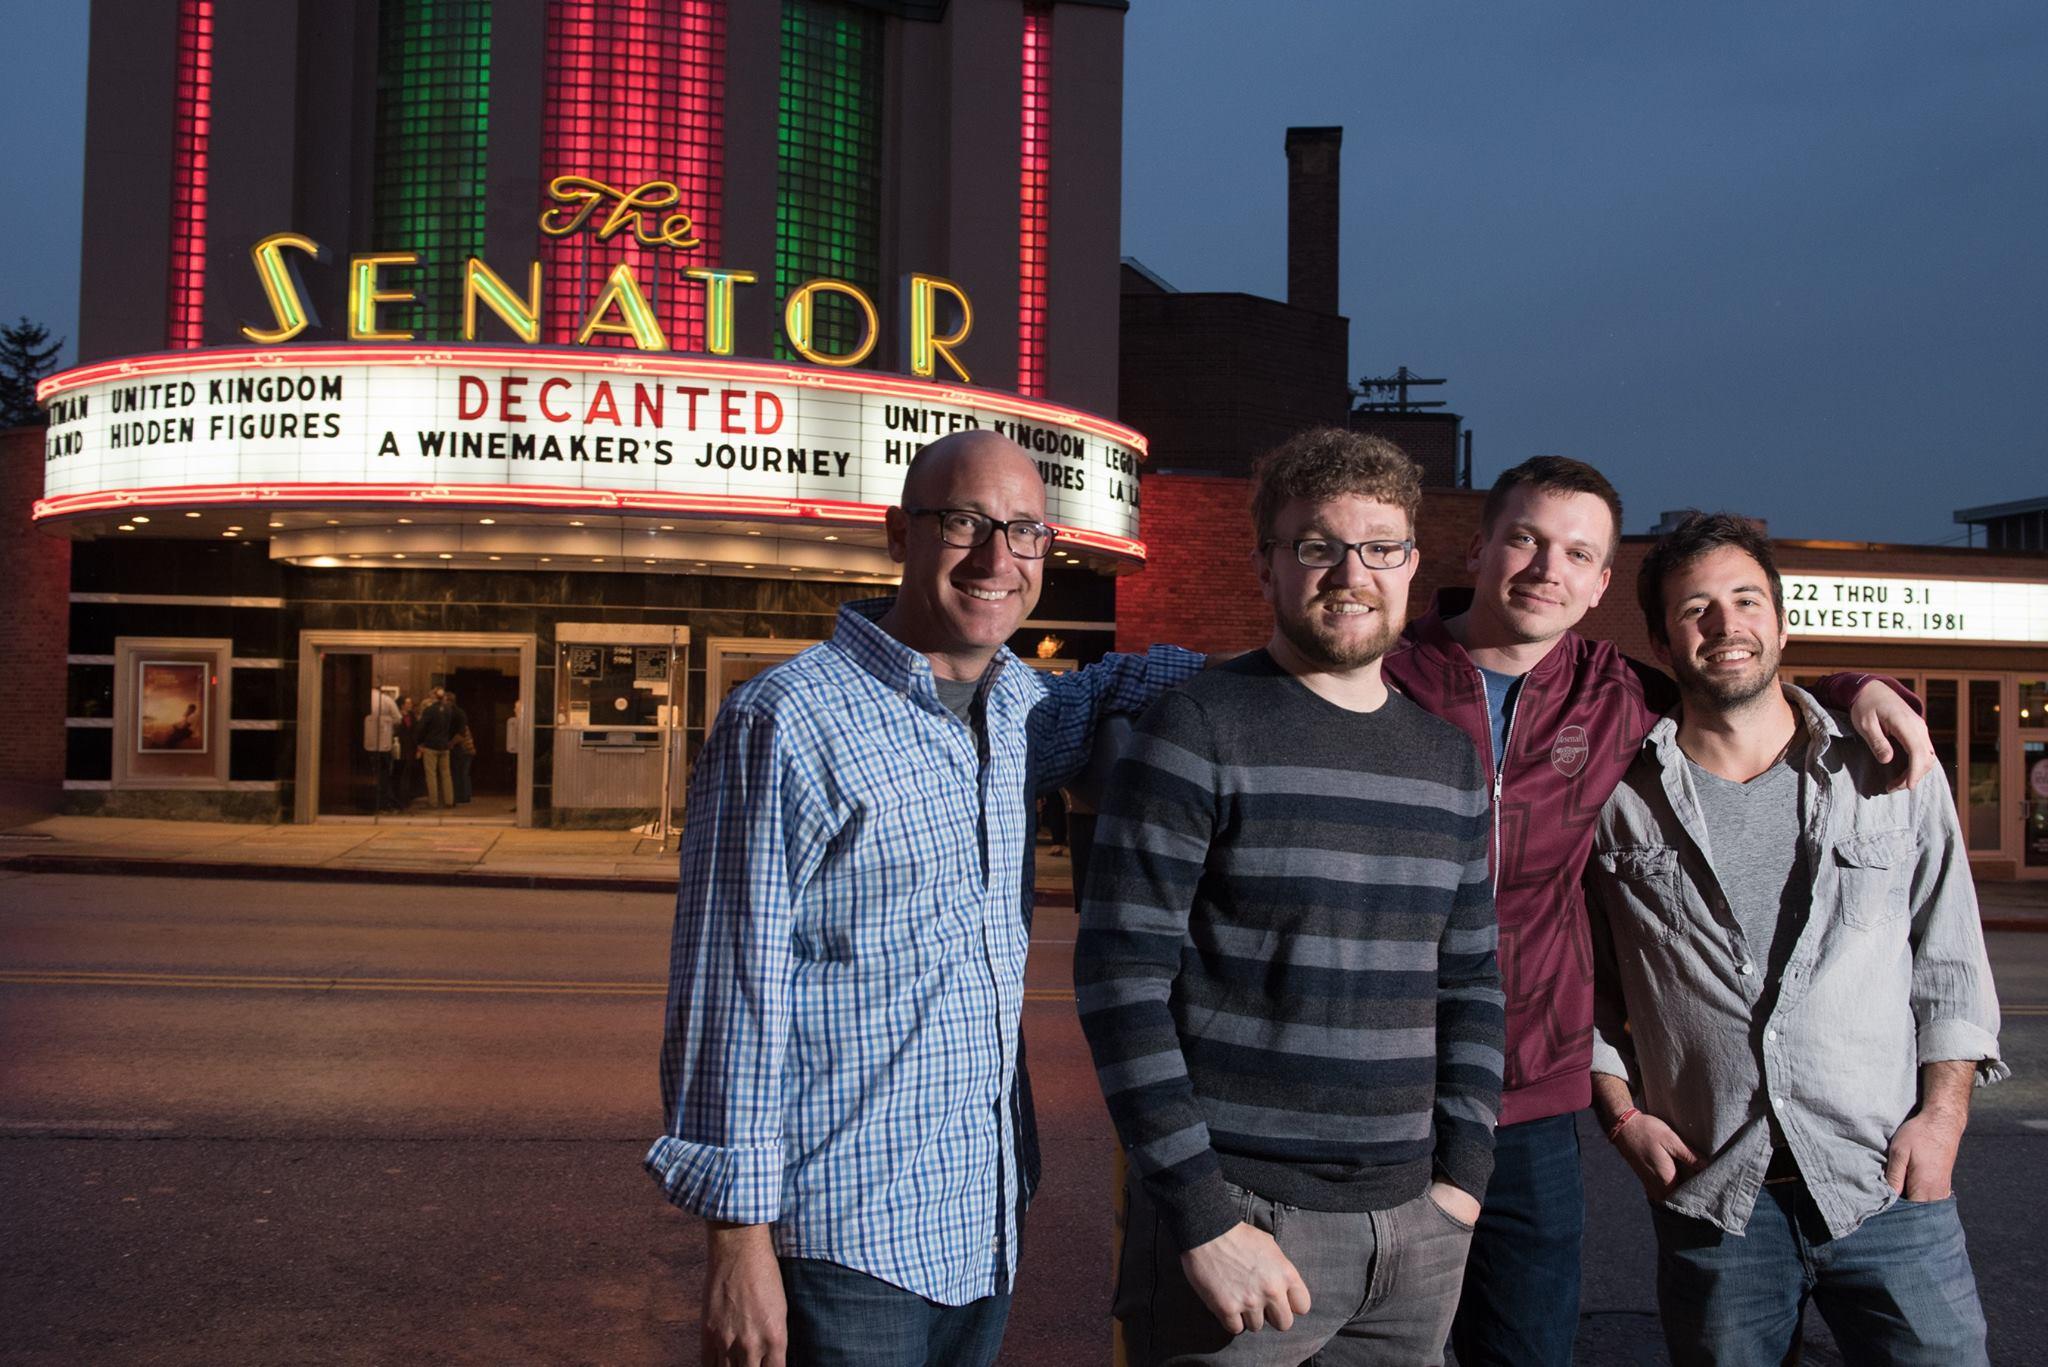 Todd Yuhanick, Matthew Riggieri, Nicholas Kovacic, and Nate Pesce